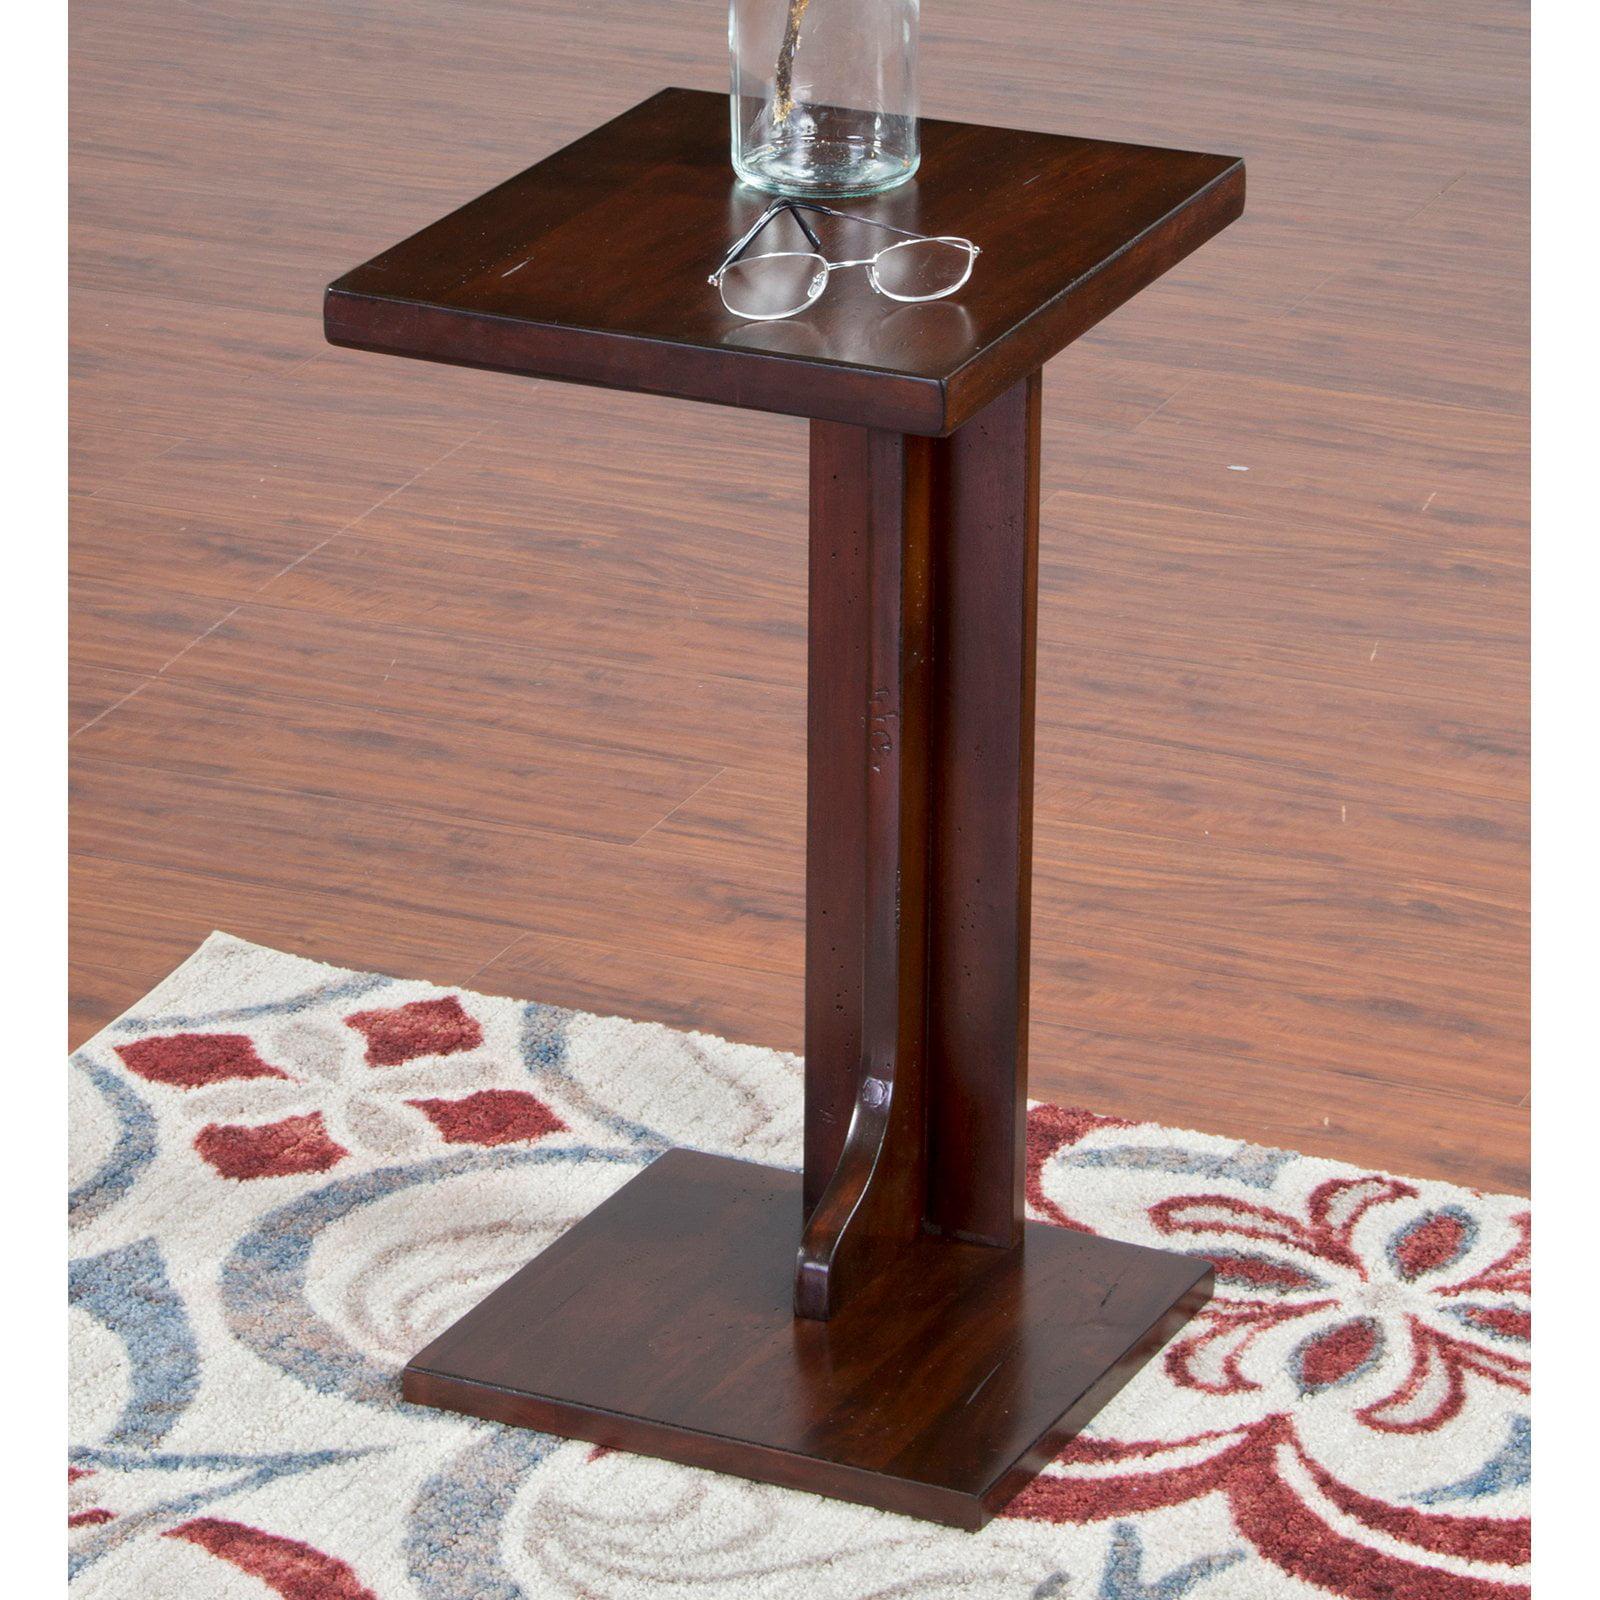 Sunny Designs Vineyard End Table - Rustic Mahogany